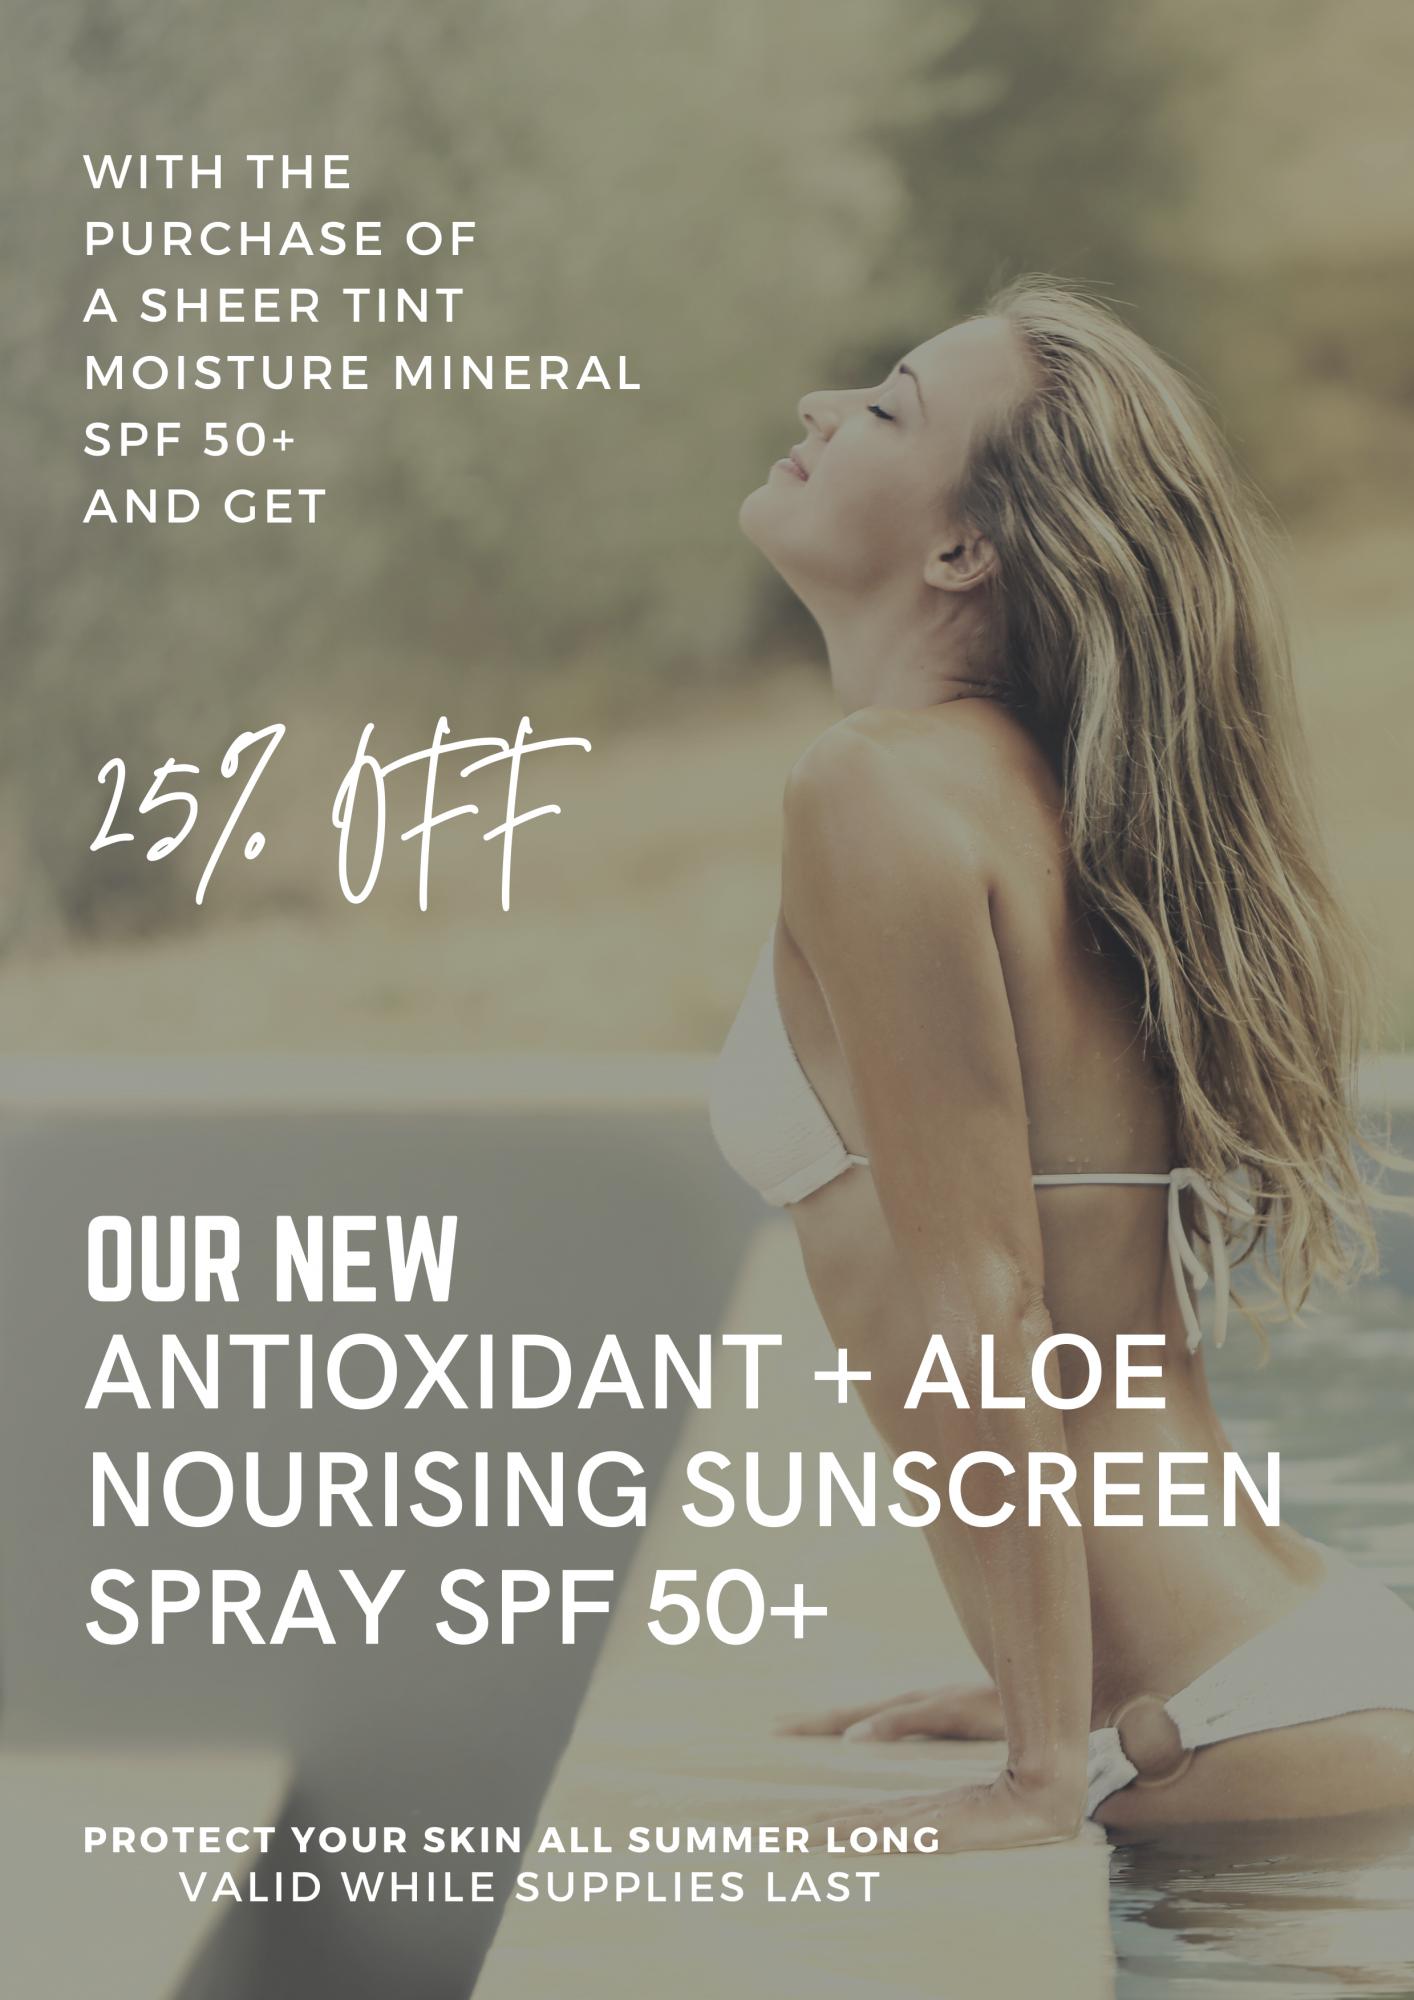 Aesthetic Plastic Surgery Summer Special - Aloe Nourishing Sunscreen Spray